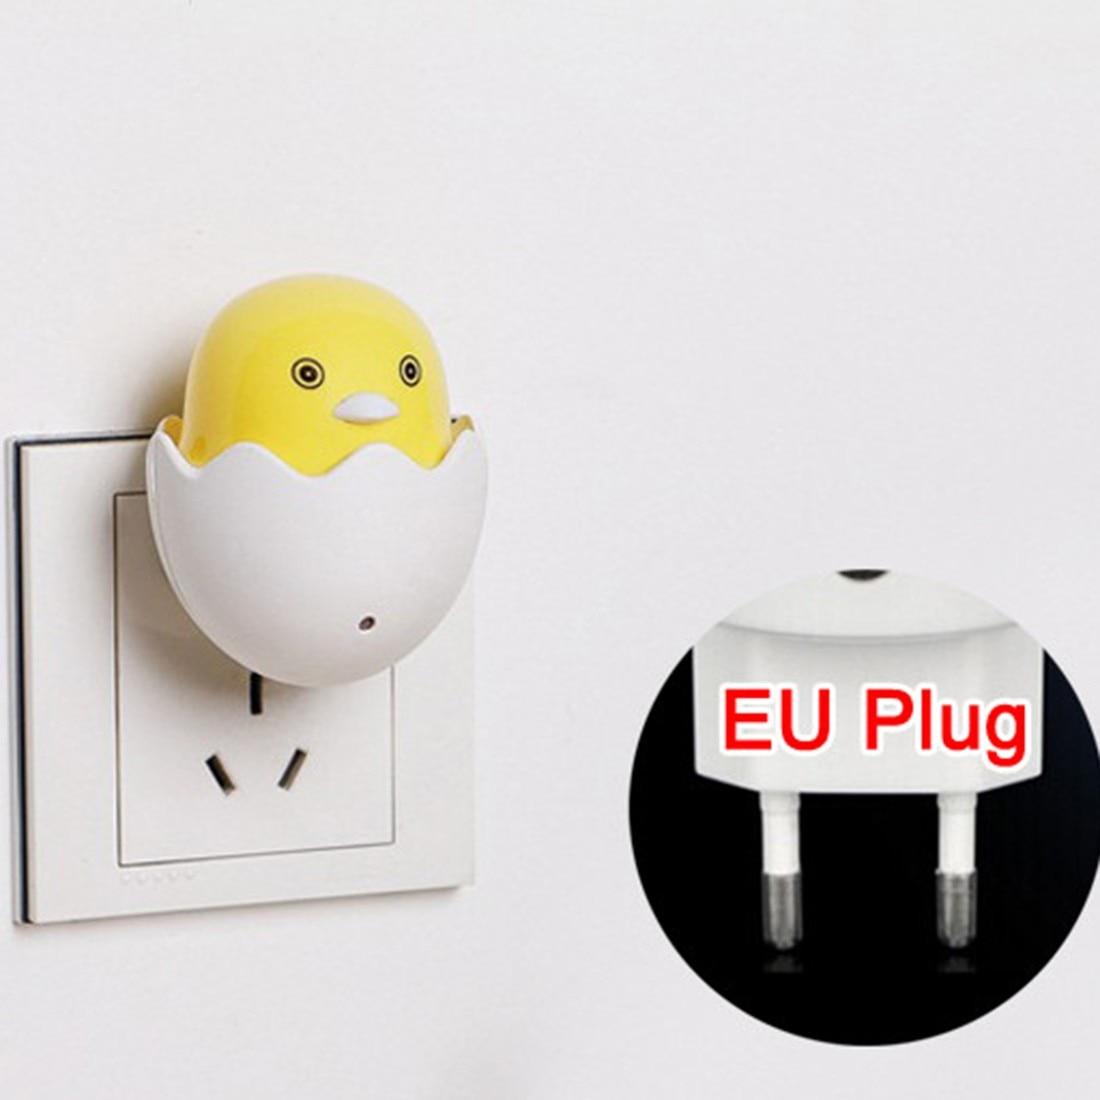 EU Plug Wall Socket Lamps LED Night Light AC 220V Light Control Sensor Yellow Duck Bedroom Wall Decor Lamp Gift For Children